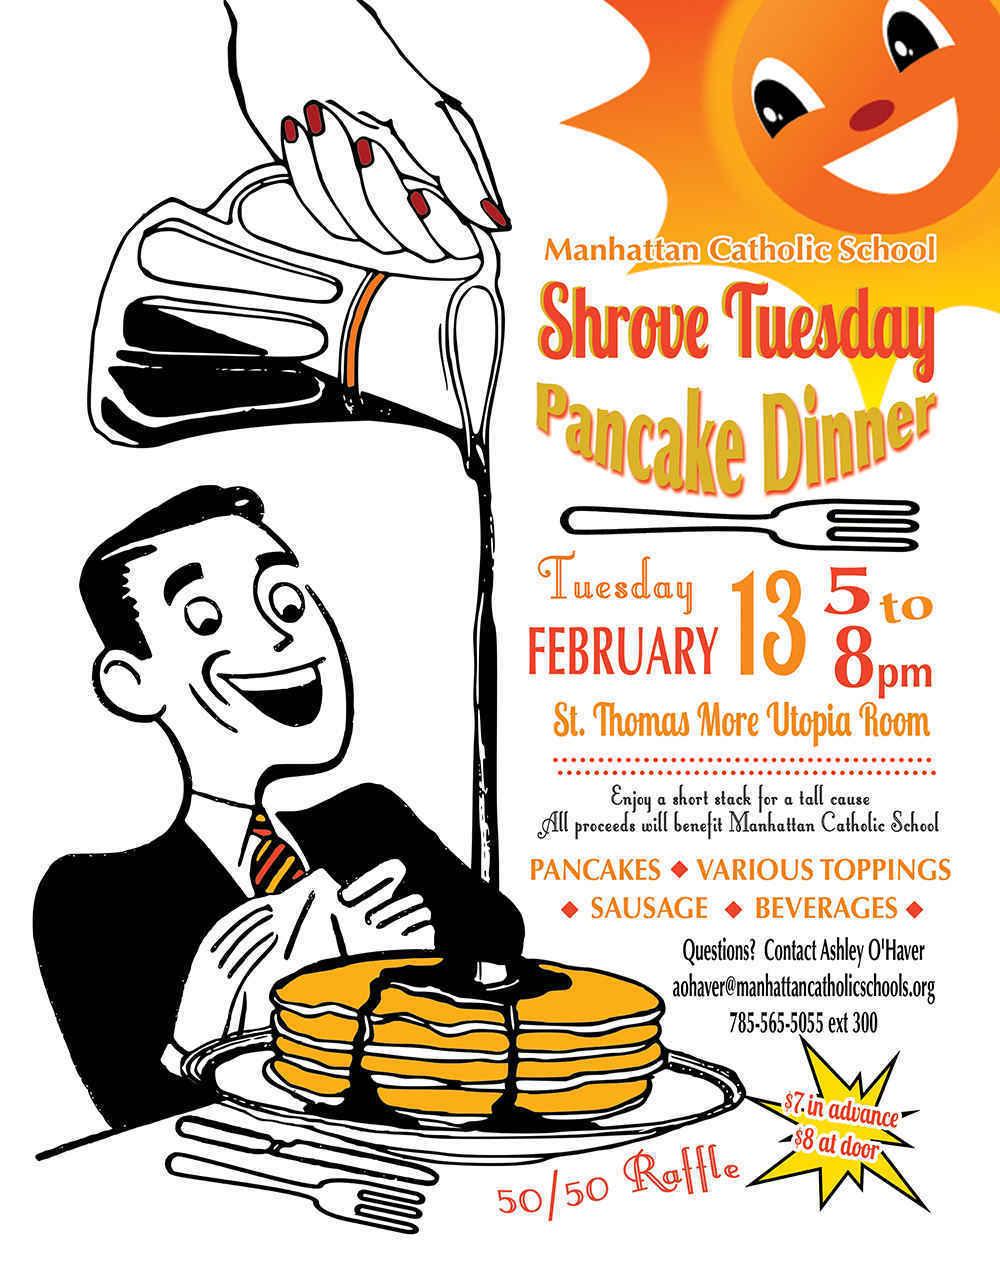 Shrove Tuesday Pancake Dinner image